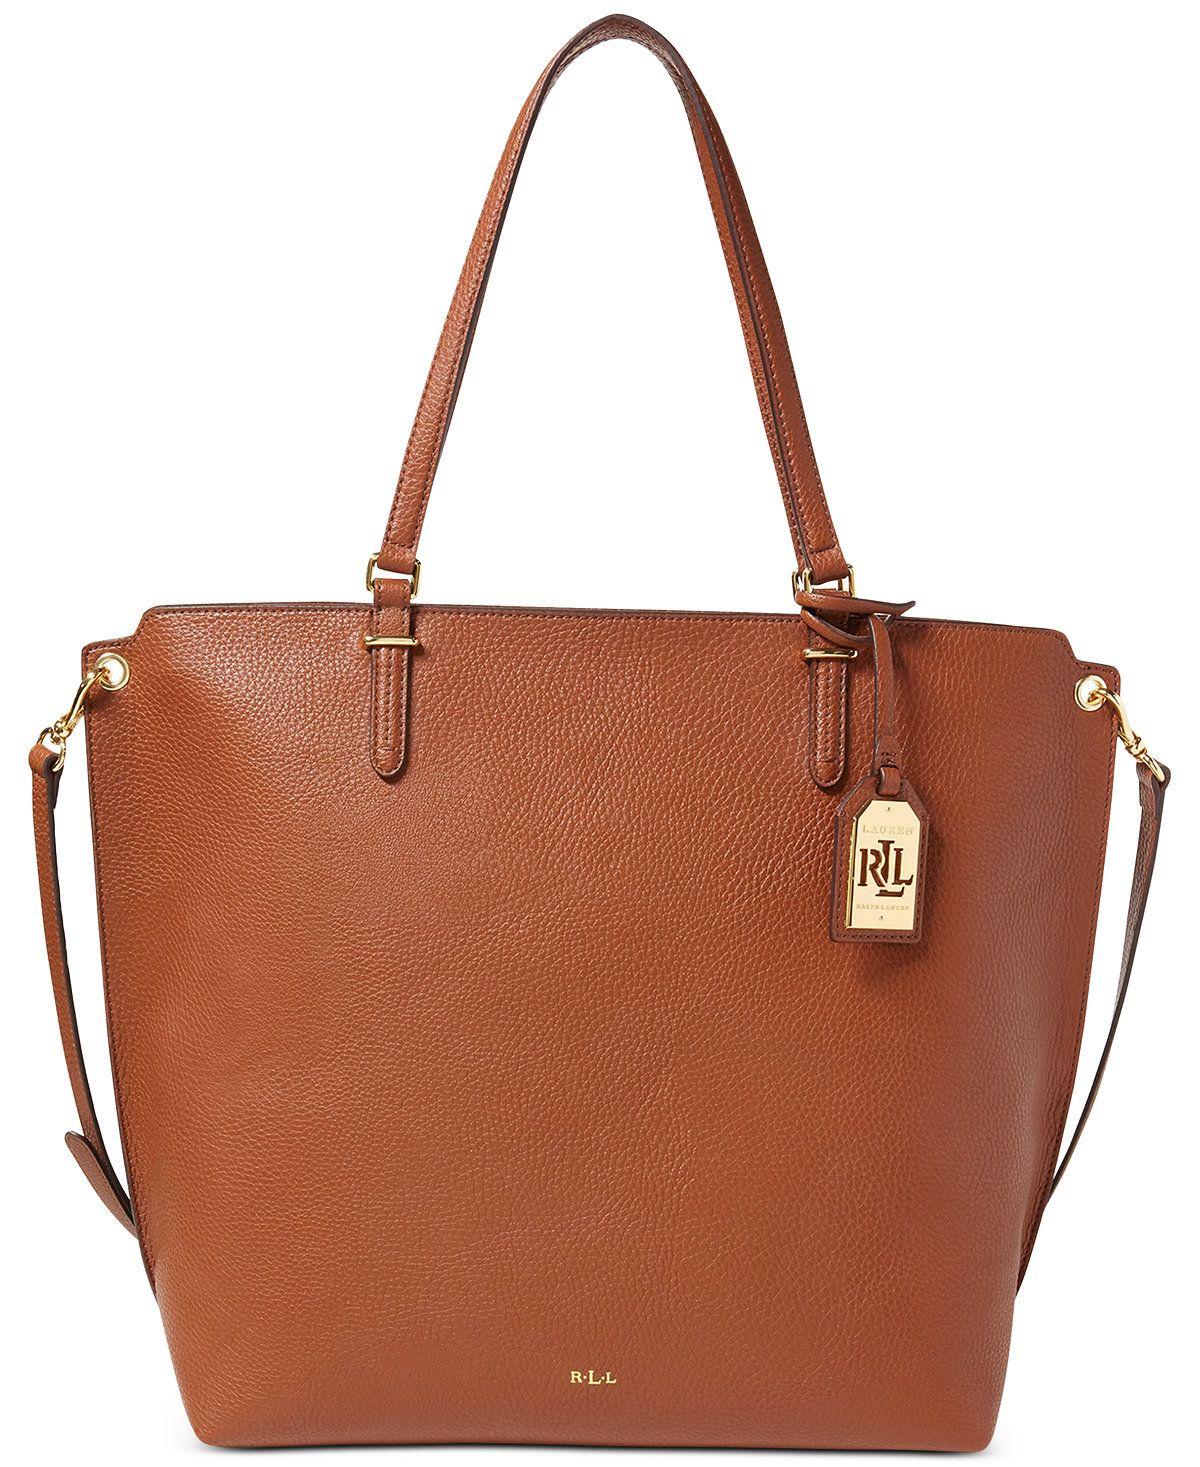 Tote Bag - Macy by VIDA VIDA Apaoz9taM